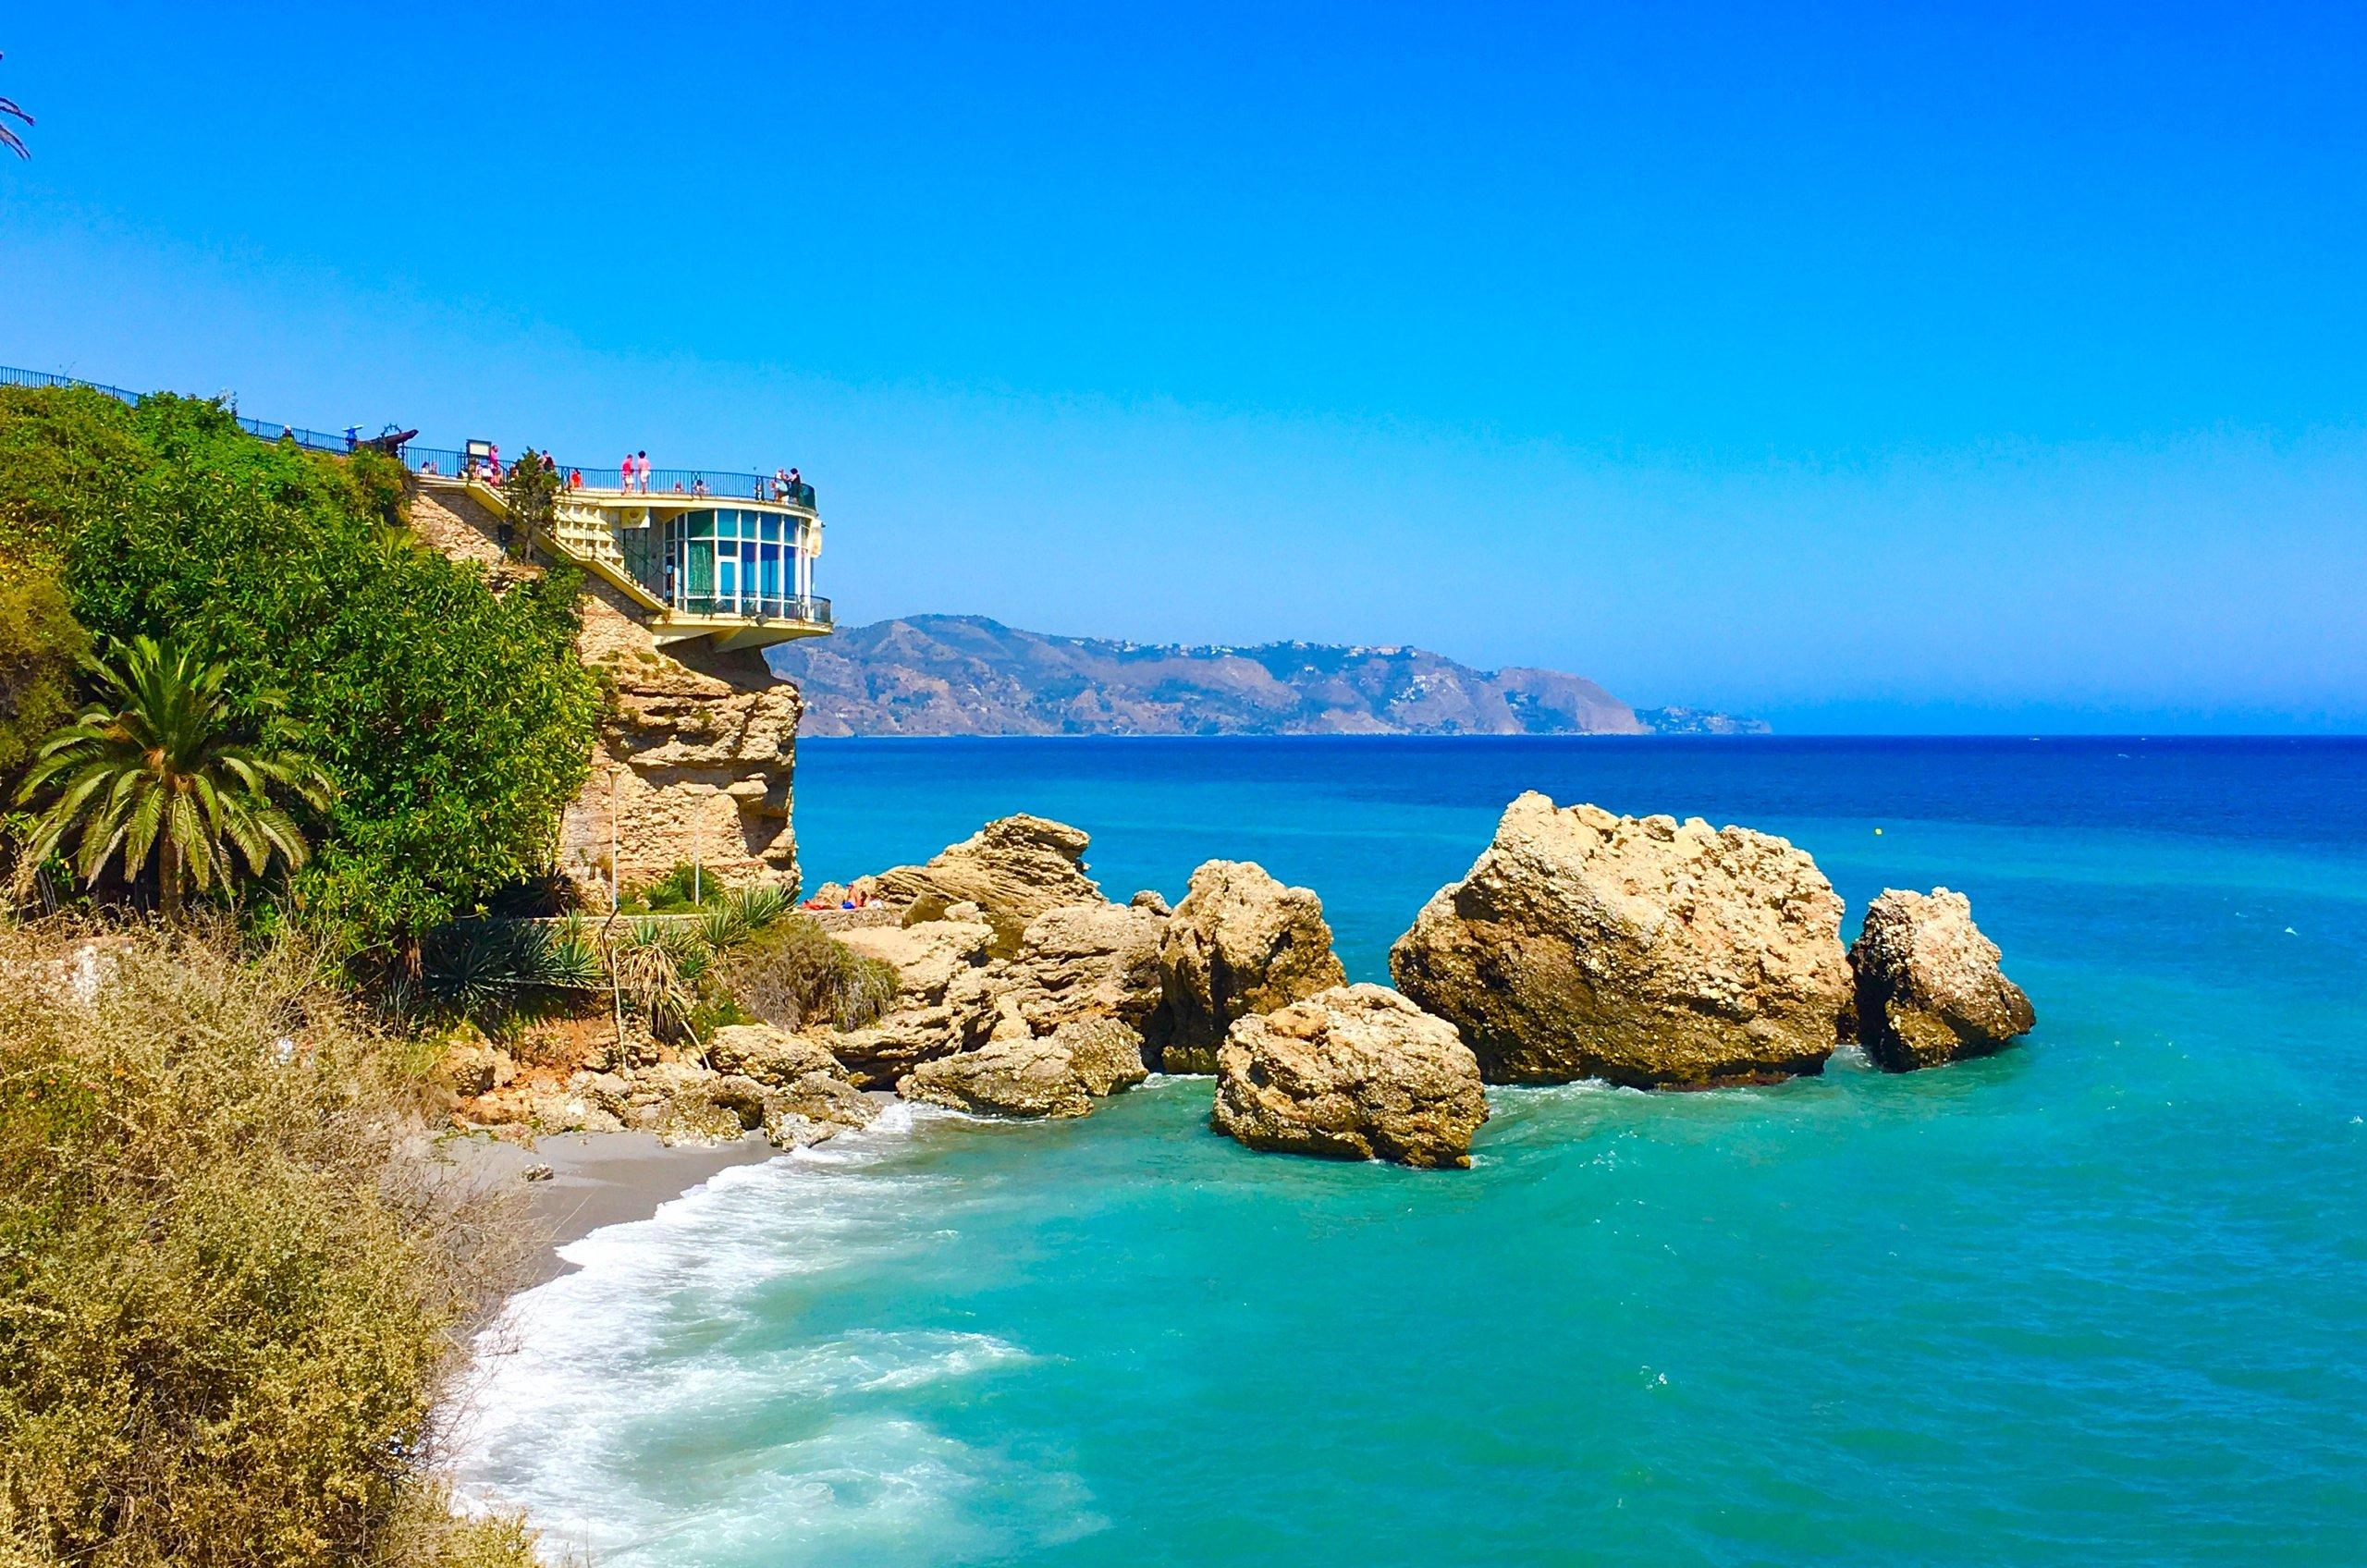 Costa del Sol 8: Best of Costa del Sol, Spain Tourism - Tripadvisor